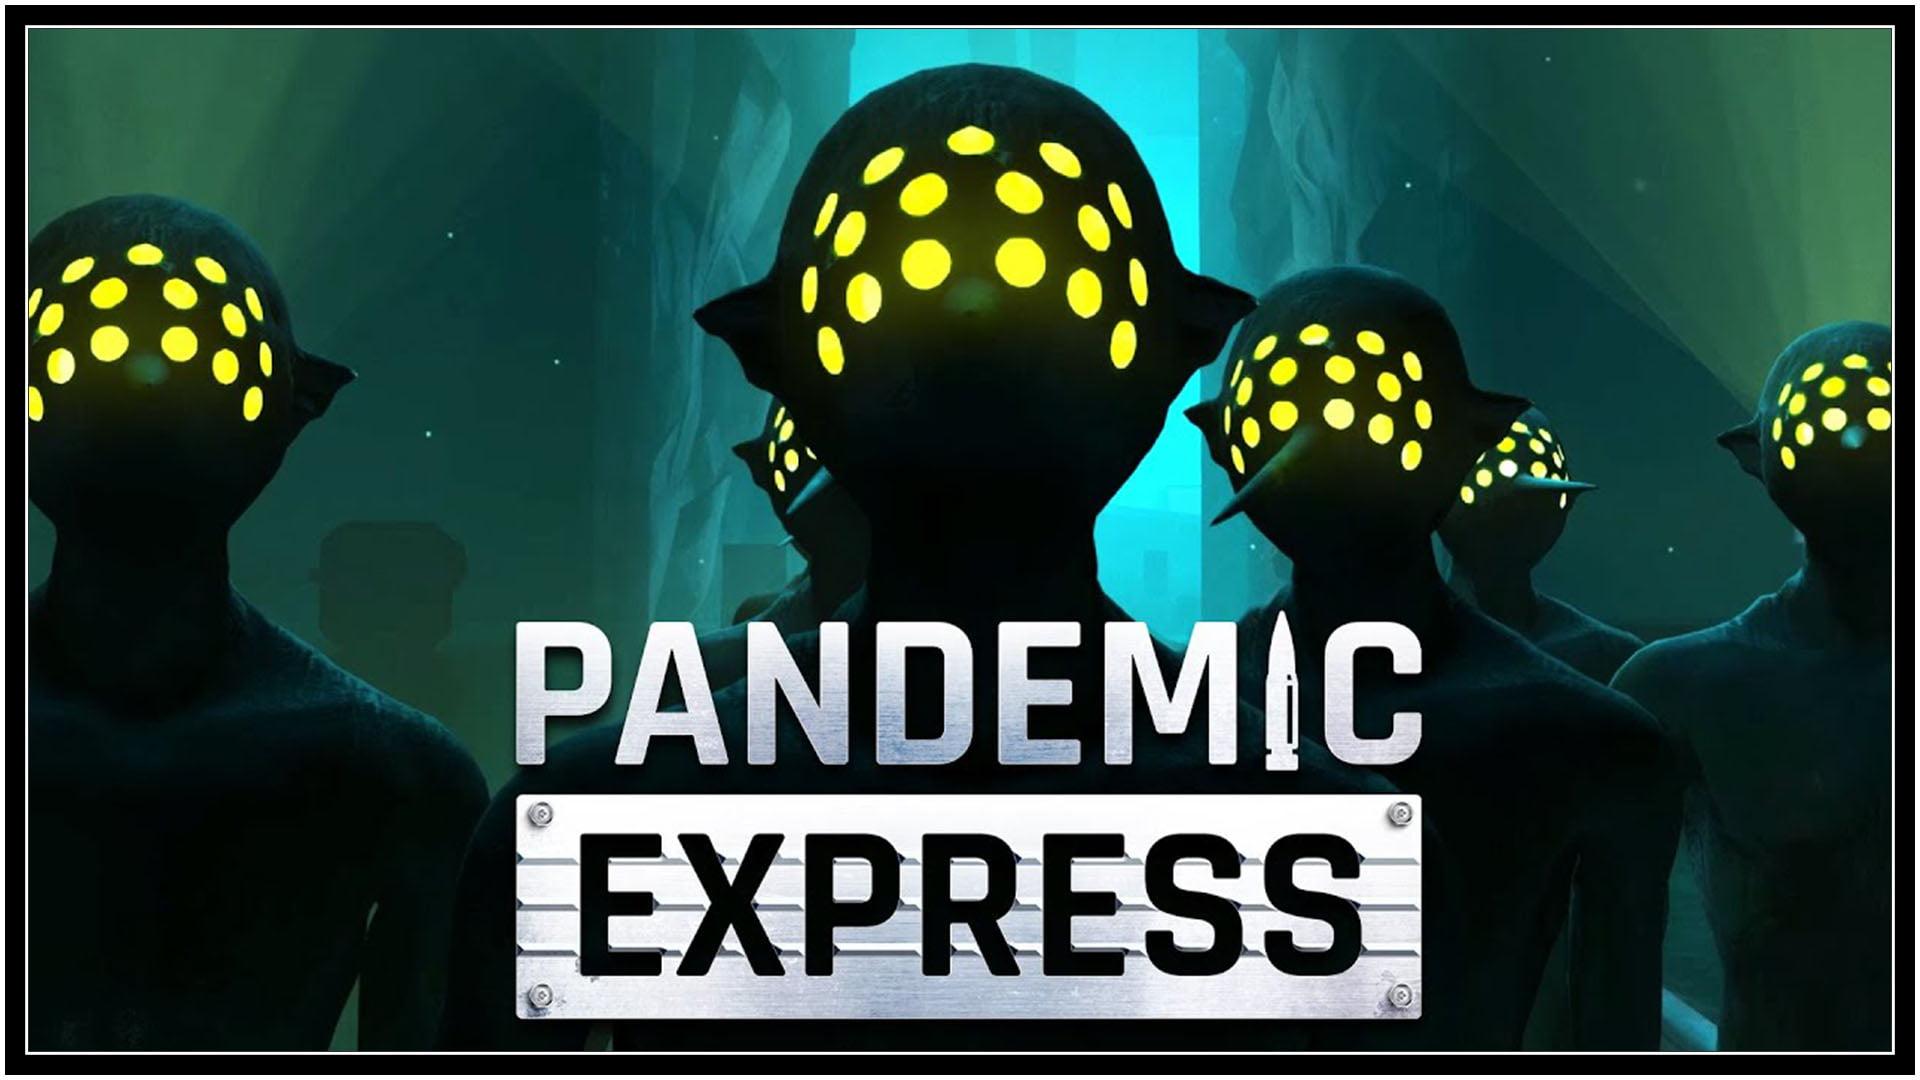 Pandemic Express Fi3